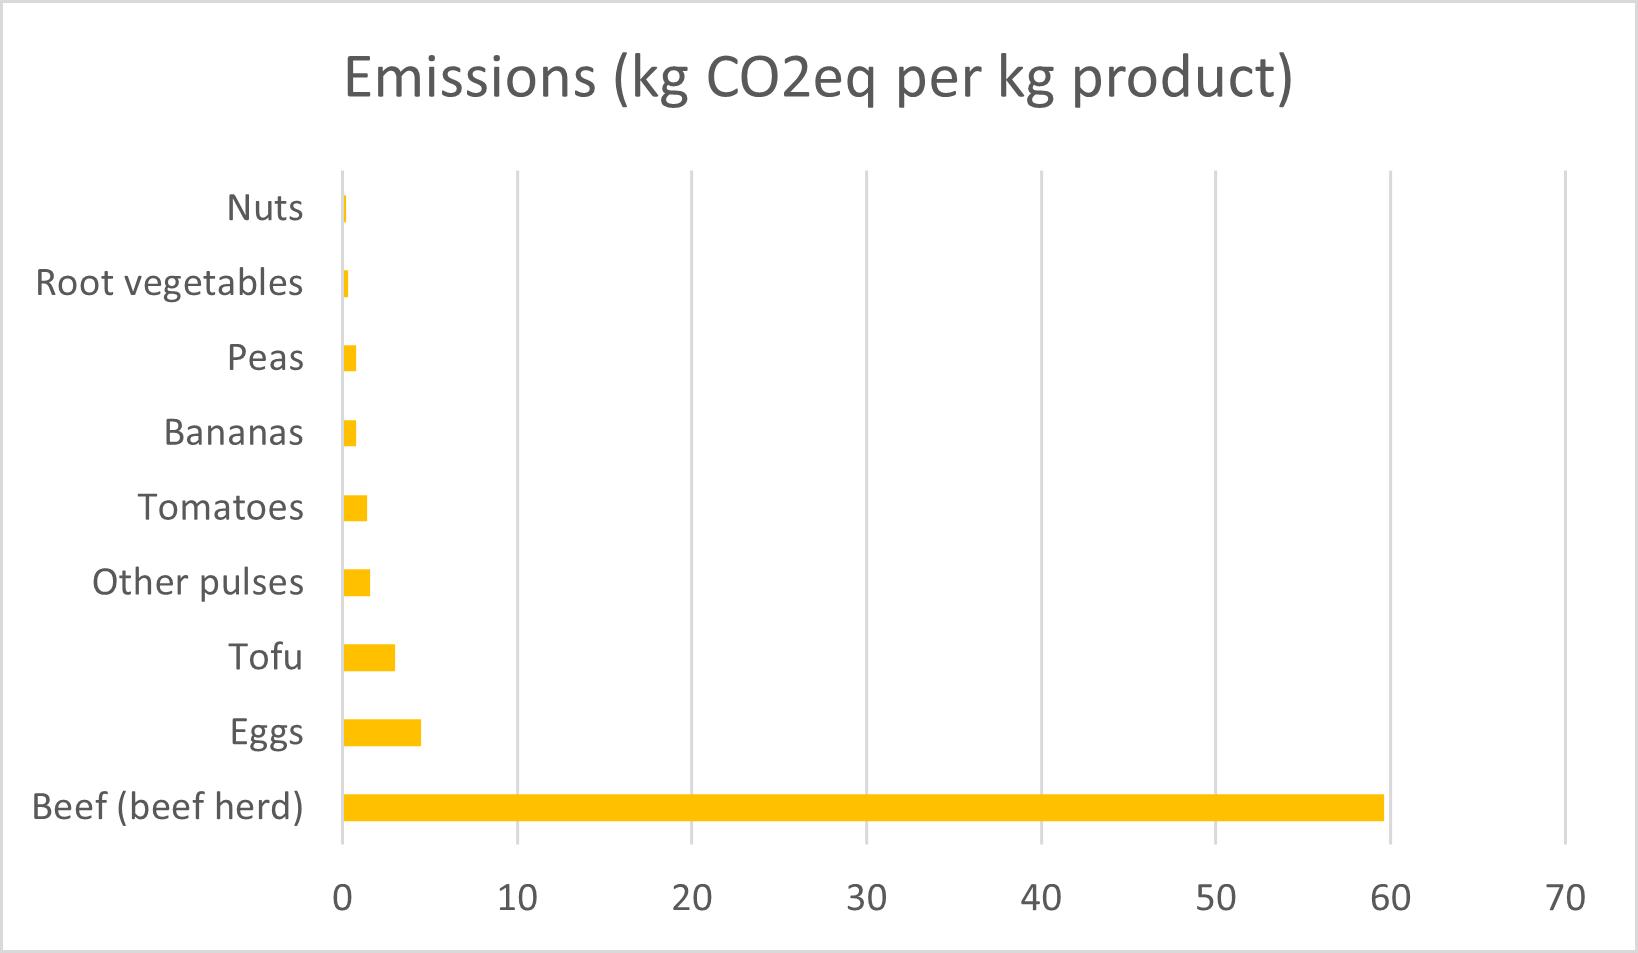 emissions in kg CO2eq per kg product